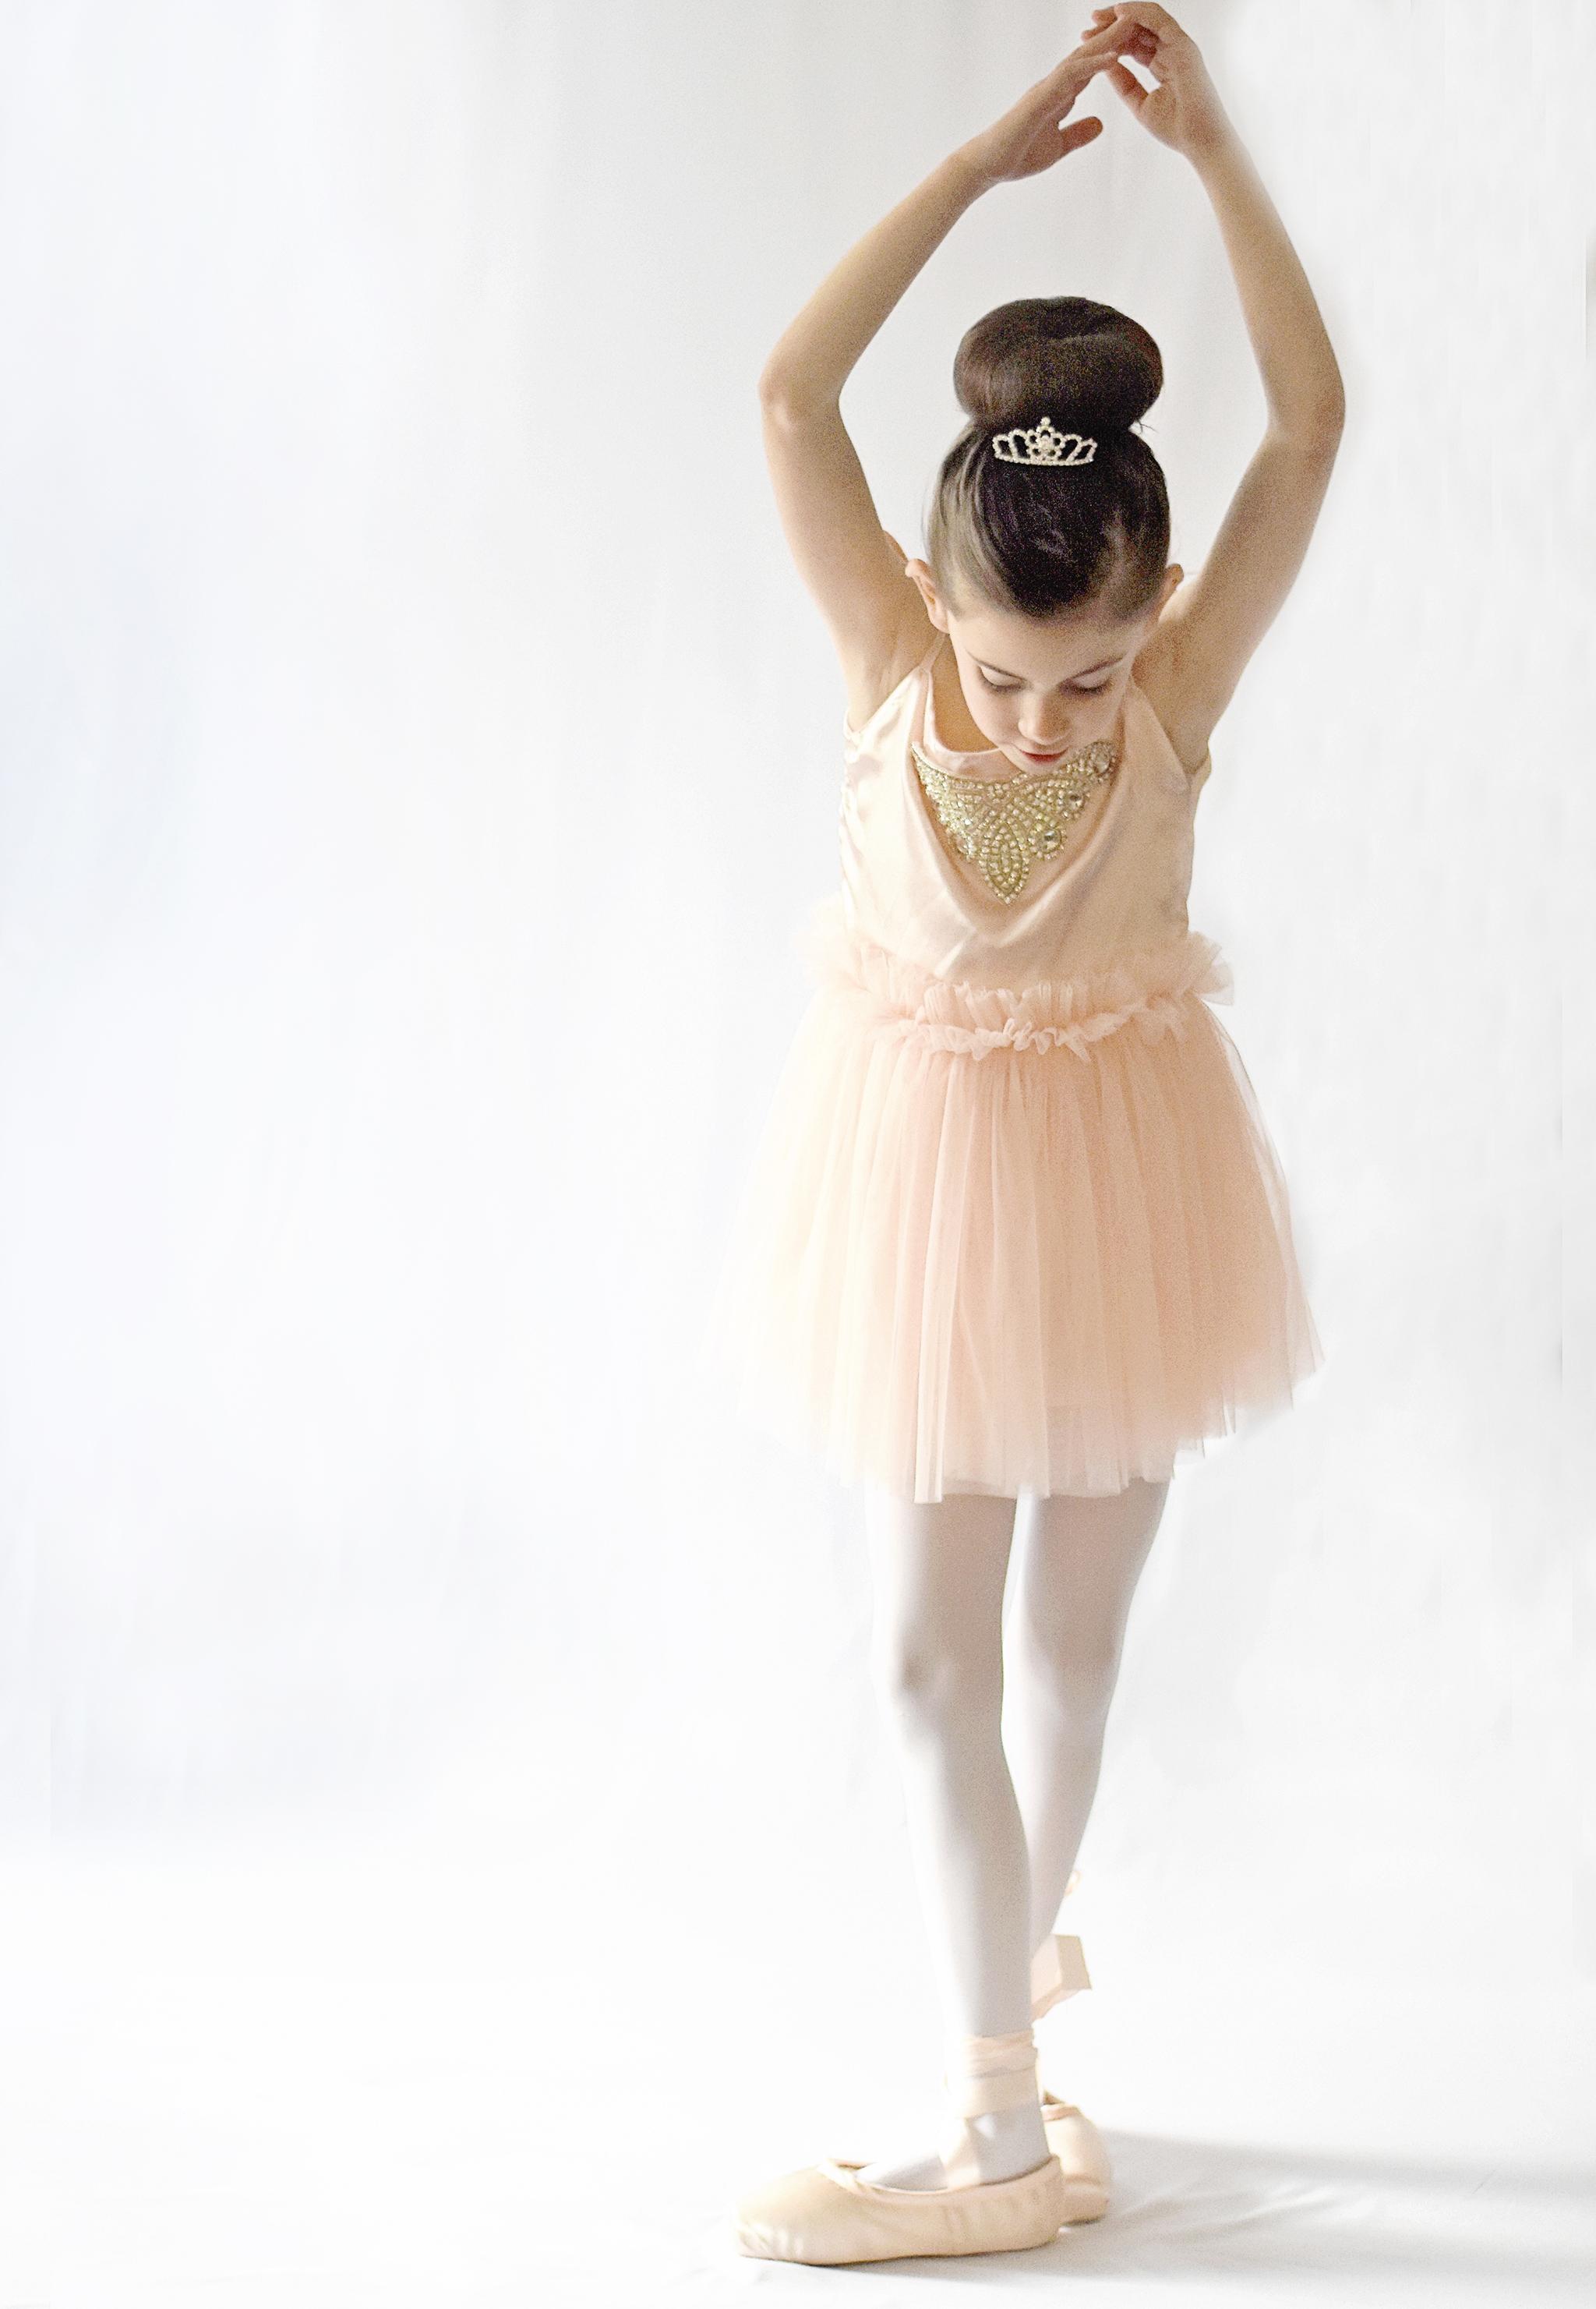 Little girls dream of being ballerinas!